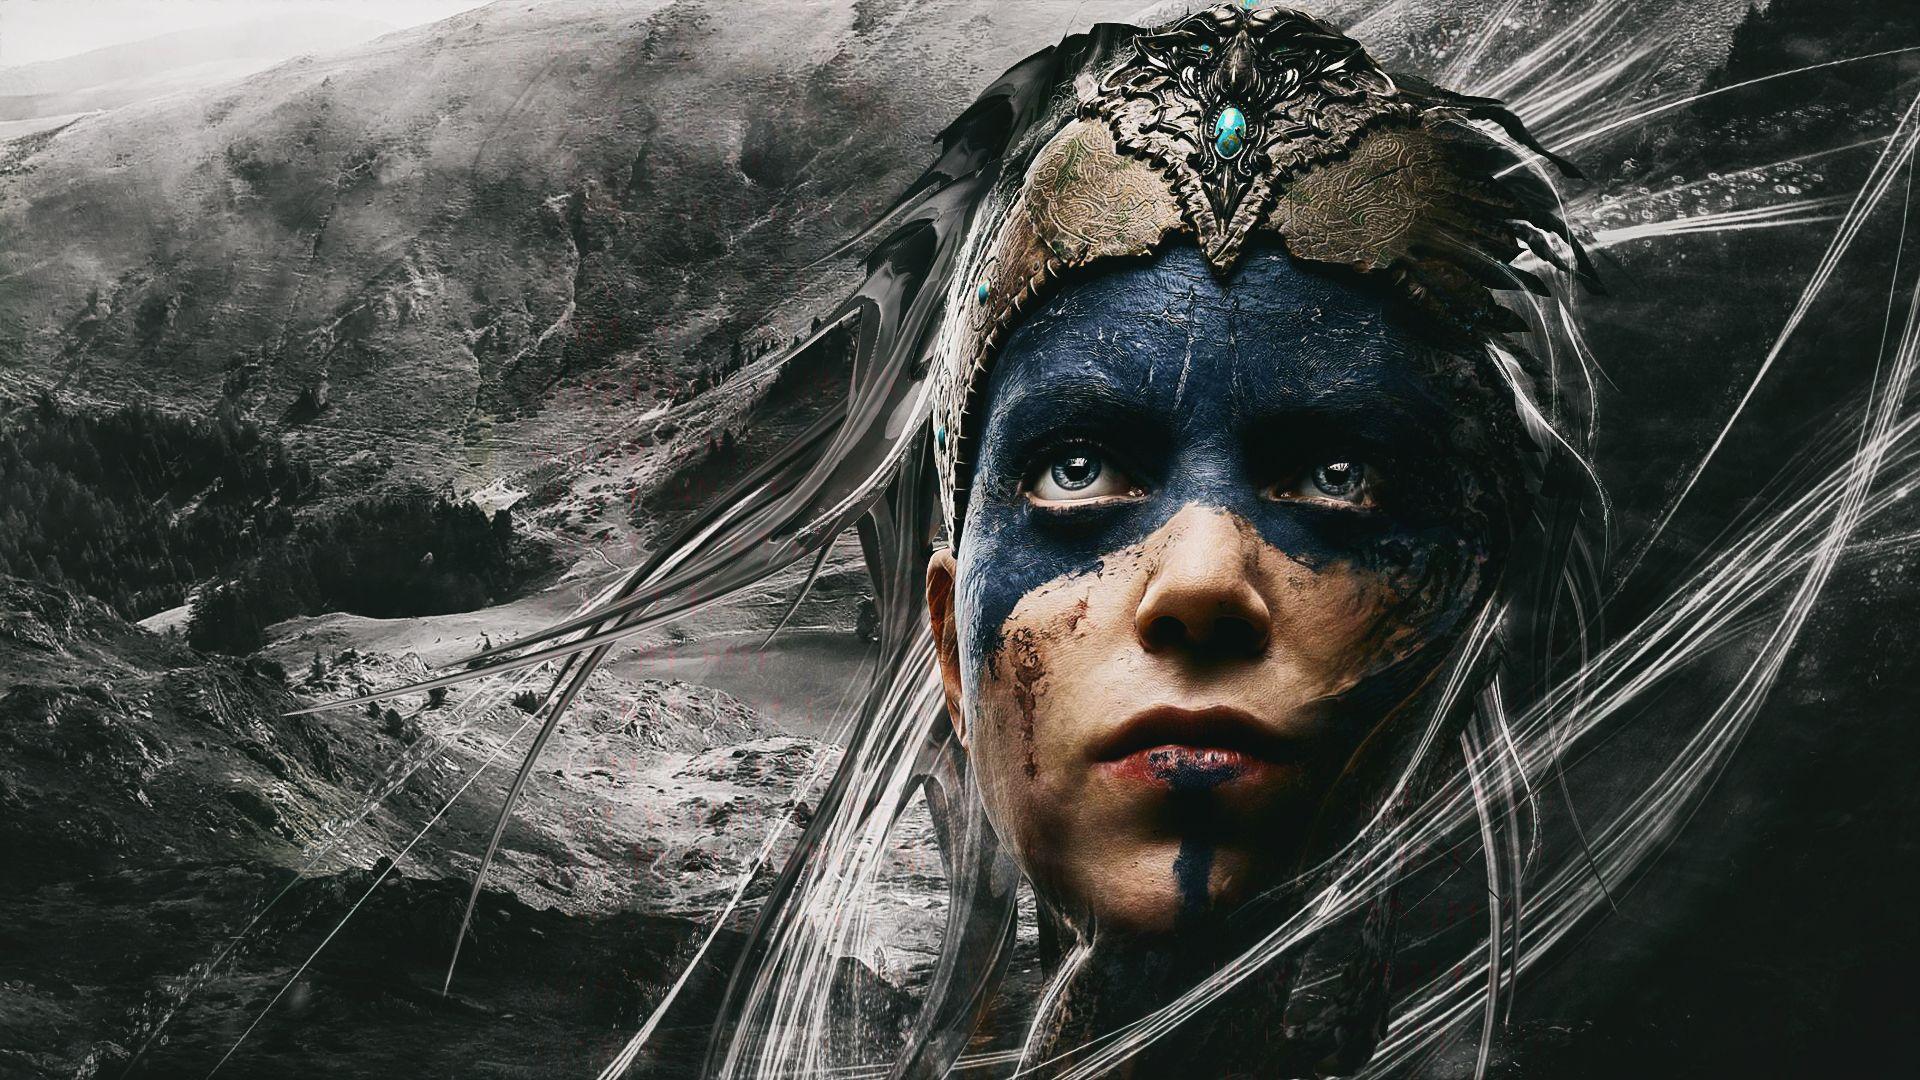 Hellblade Senuas Sacrifice Wallpaper Desktop Games